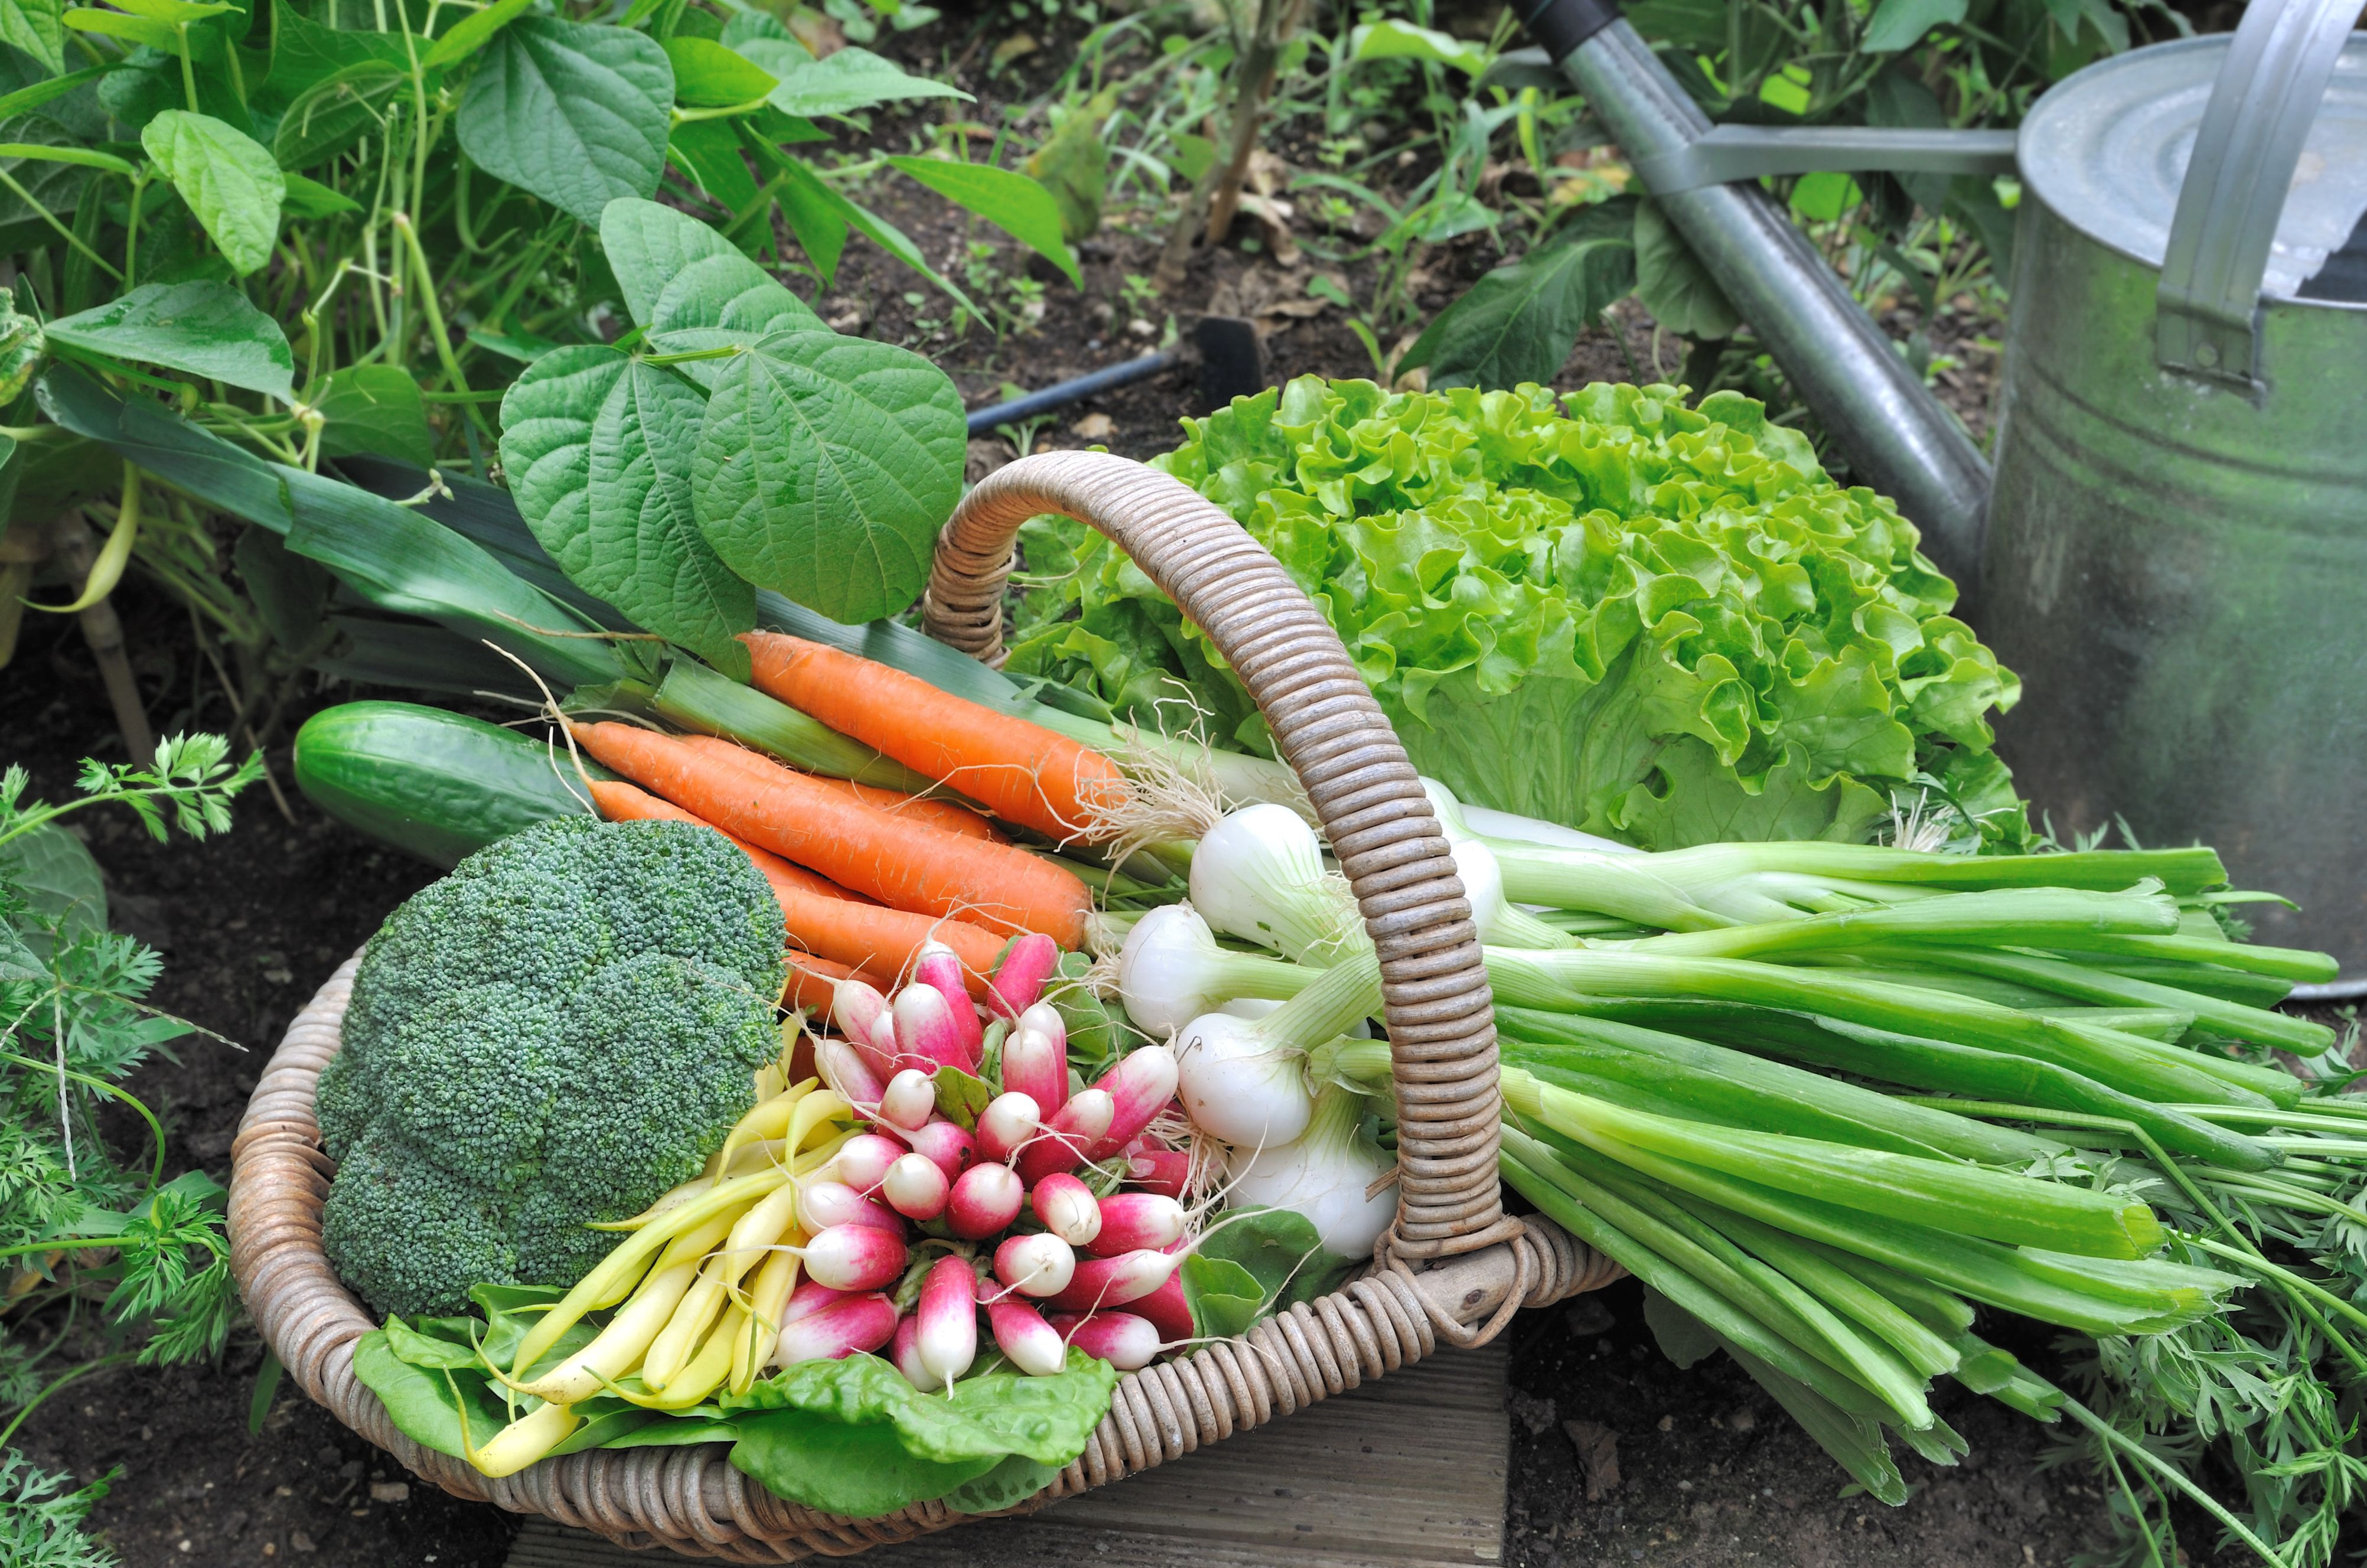 Produce From Vegetable Garden